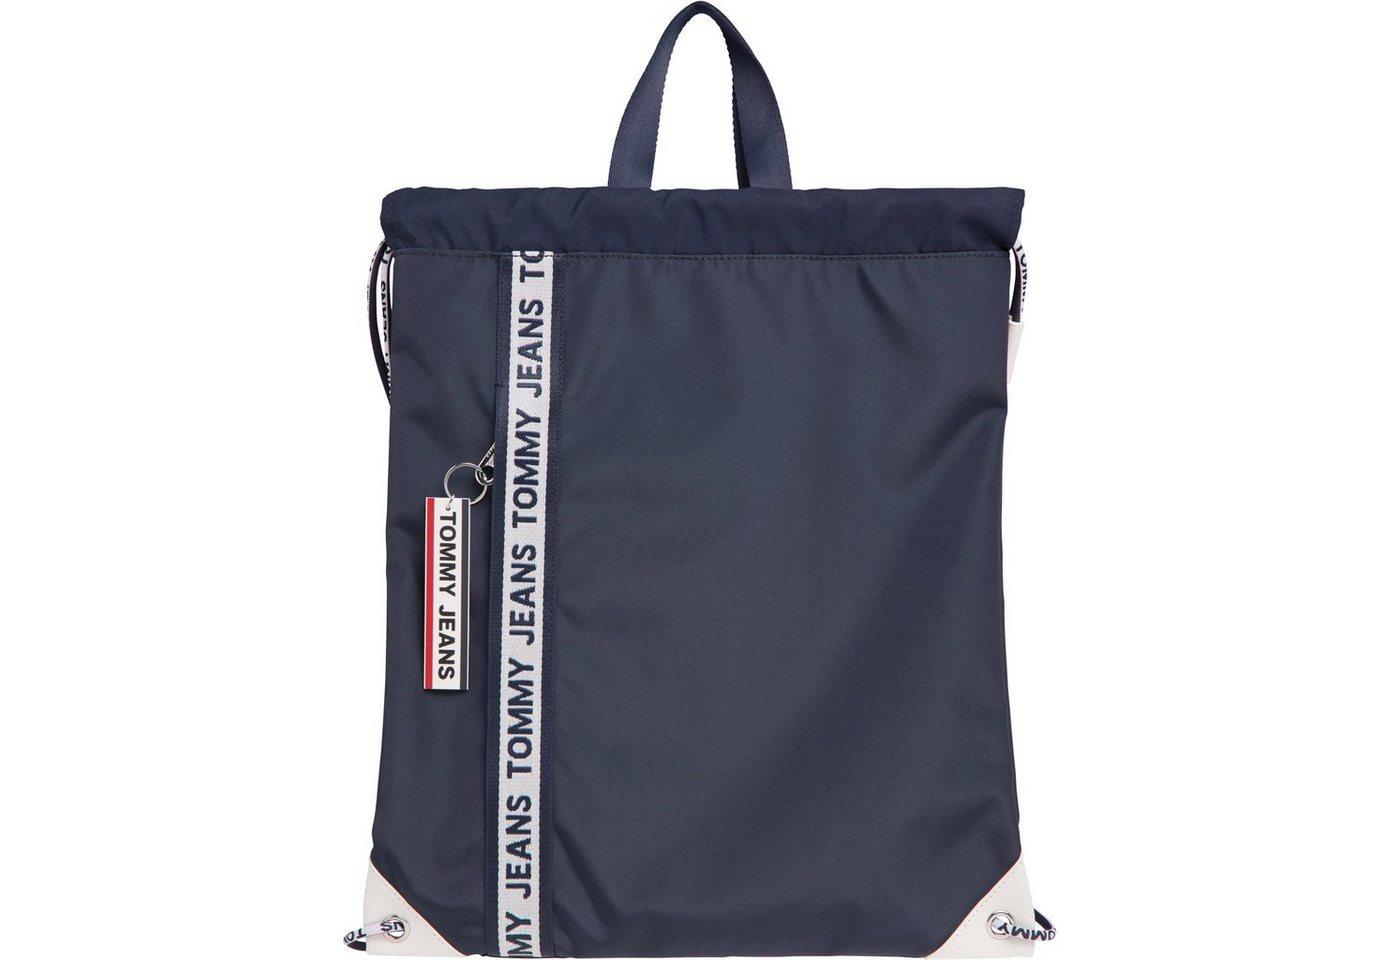 tommy jeans -  Cityrucksack »TJM LOGO TAPE DRAWSTRING NYL«, mit modischem Logo Schriftzug